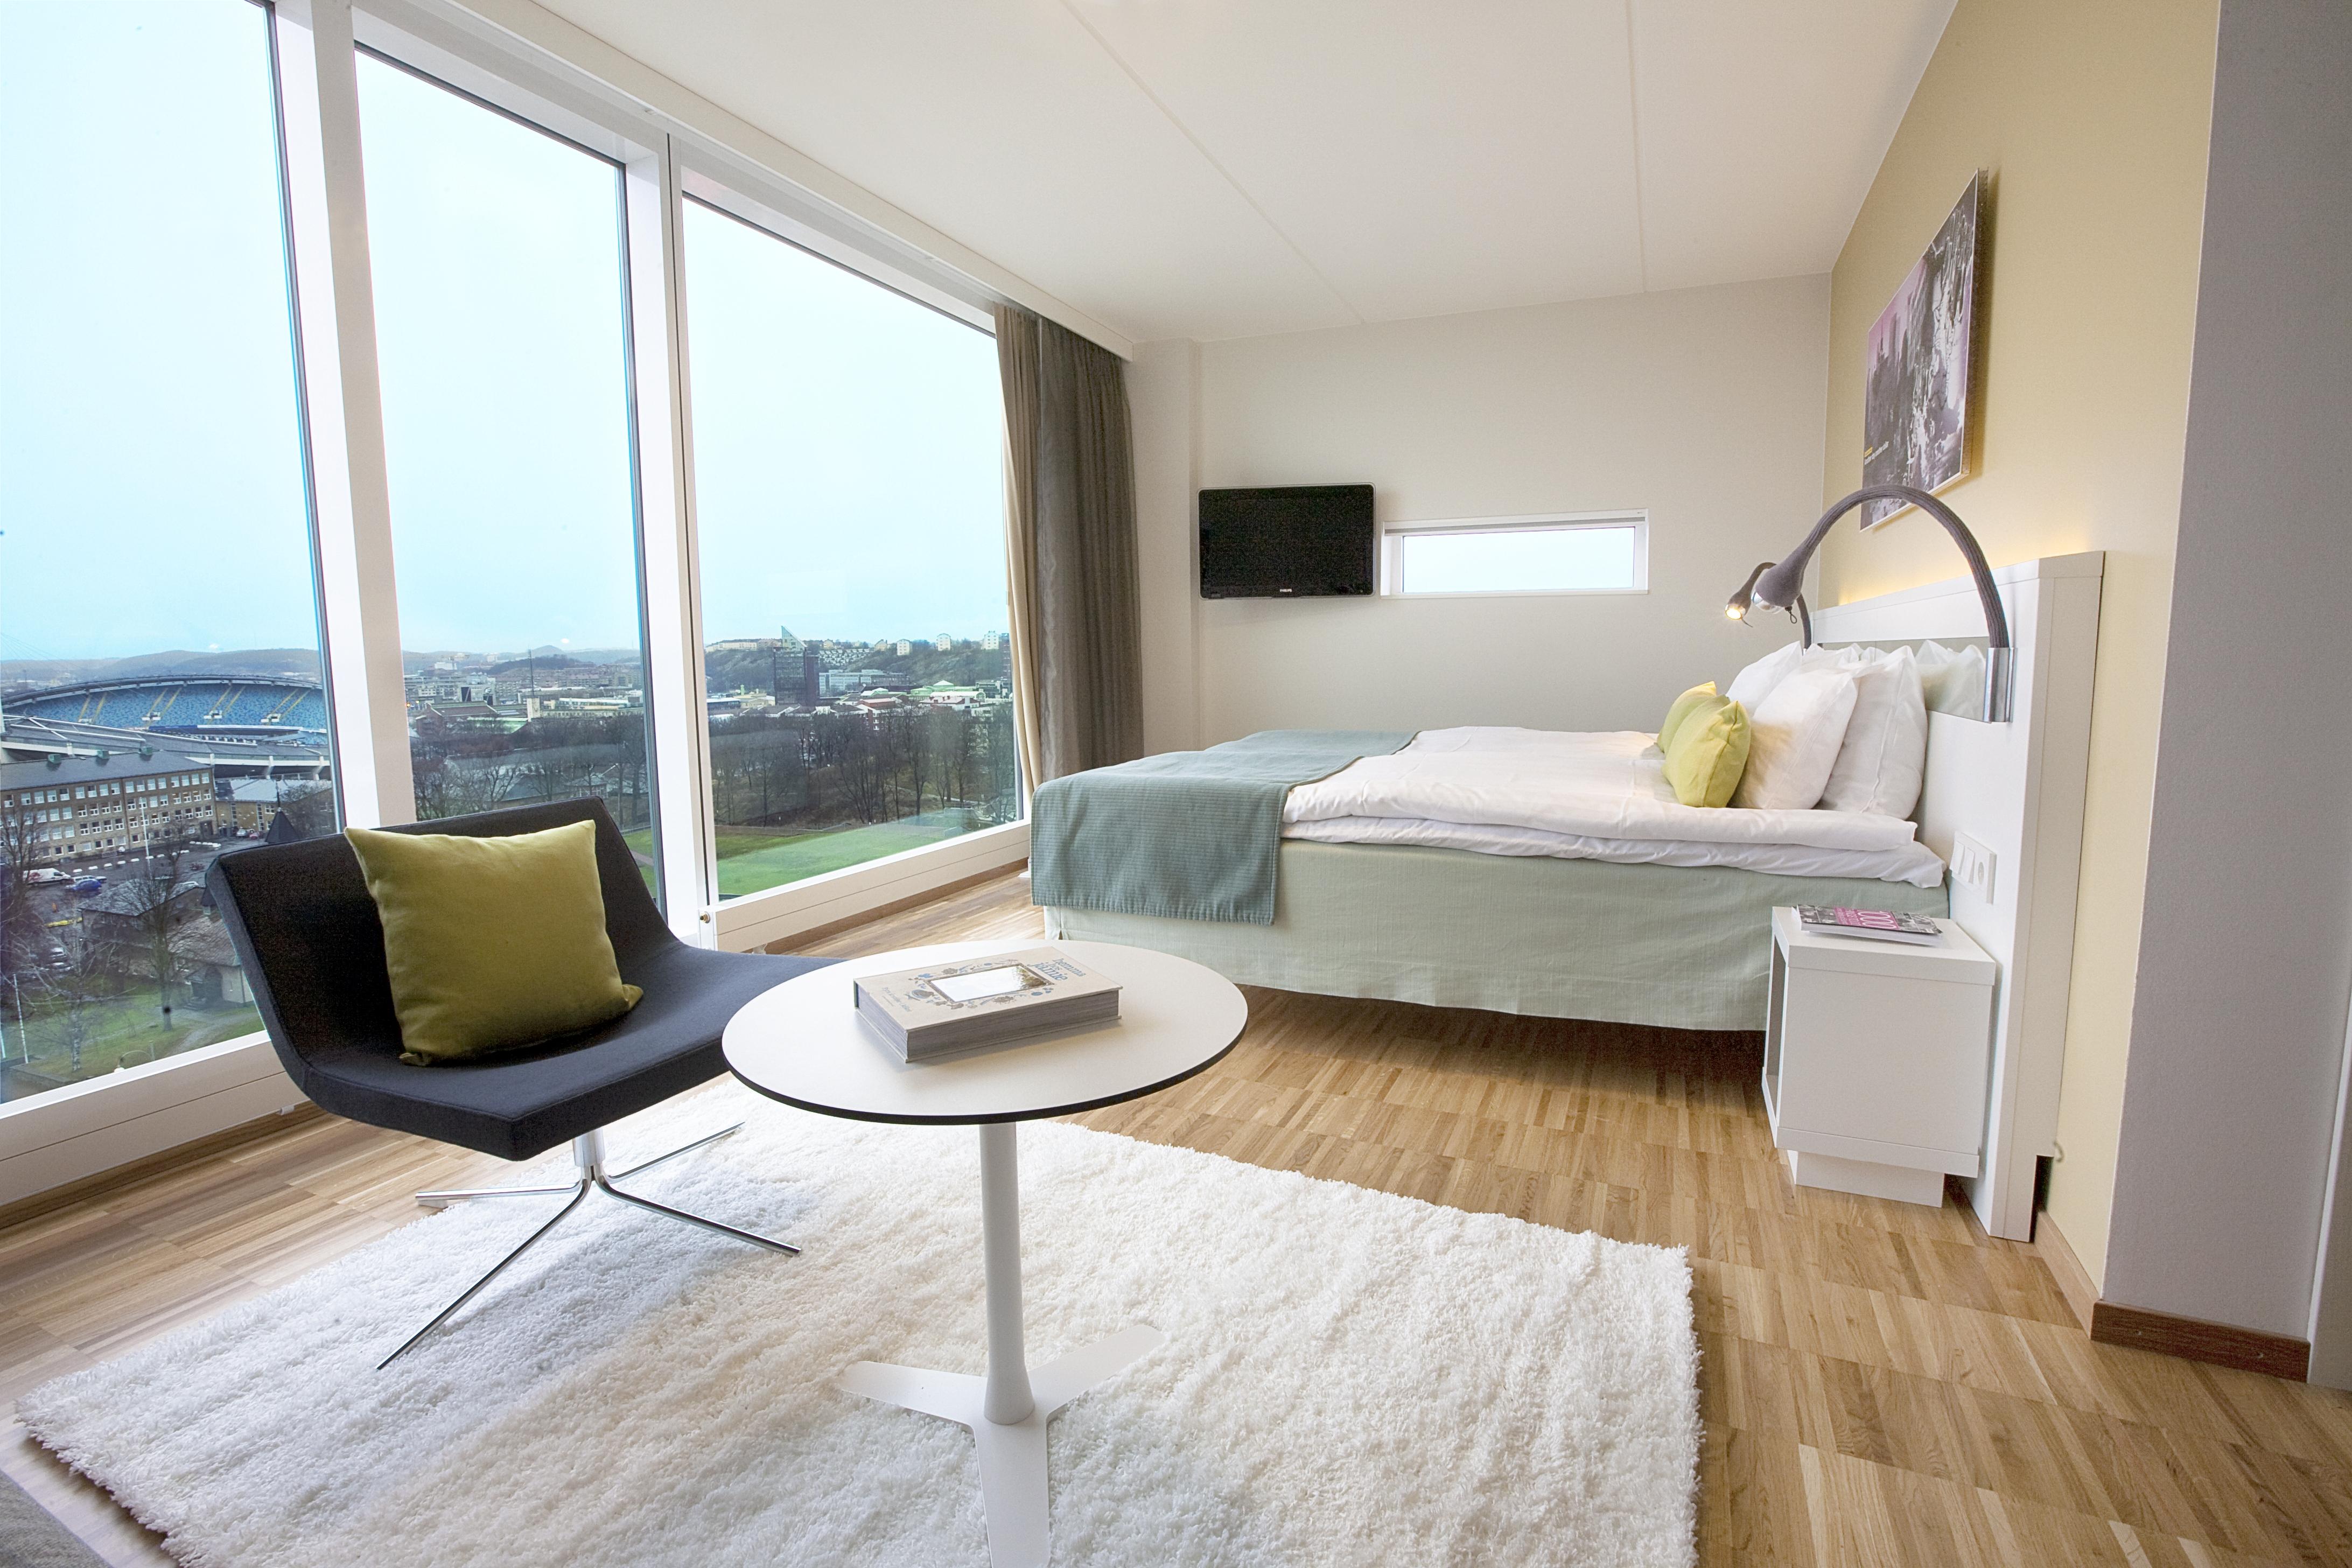 110 nya hotellrum med panoramautsikt över Göteborg